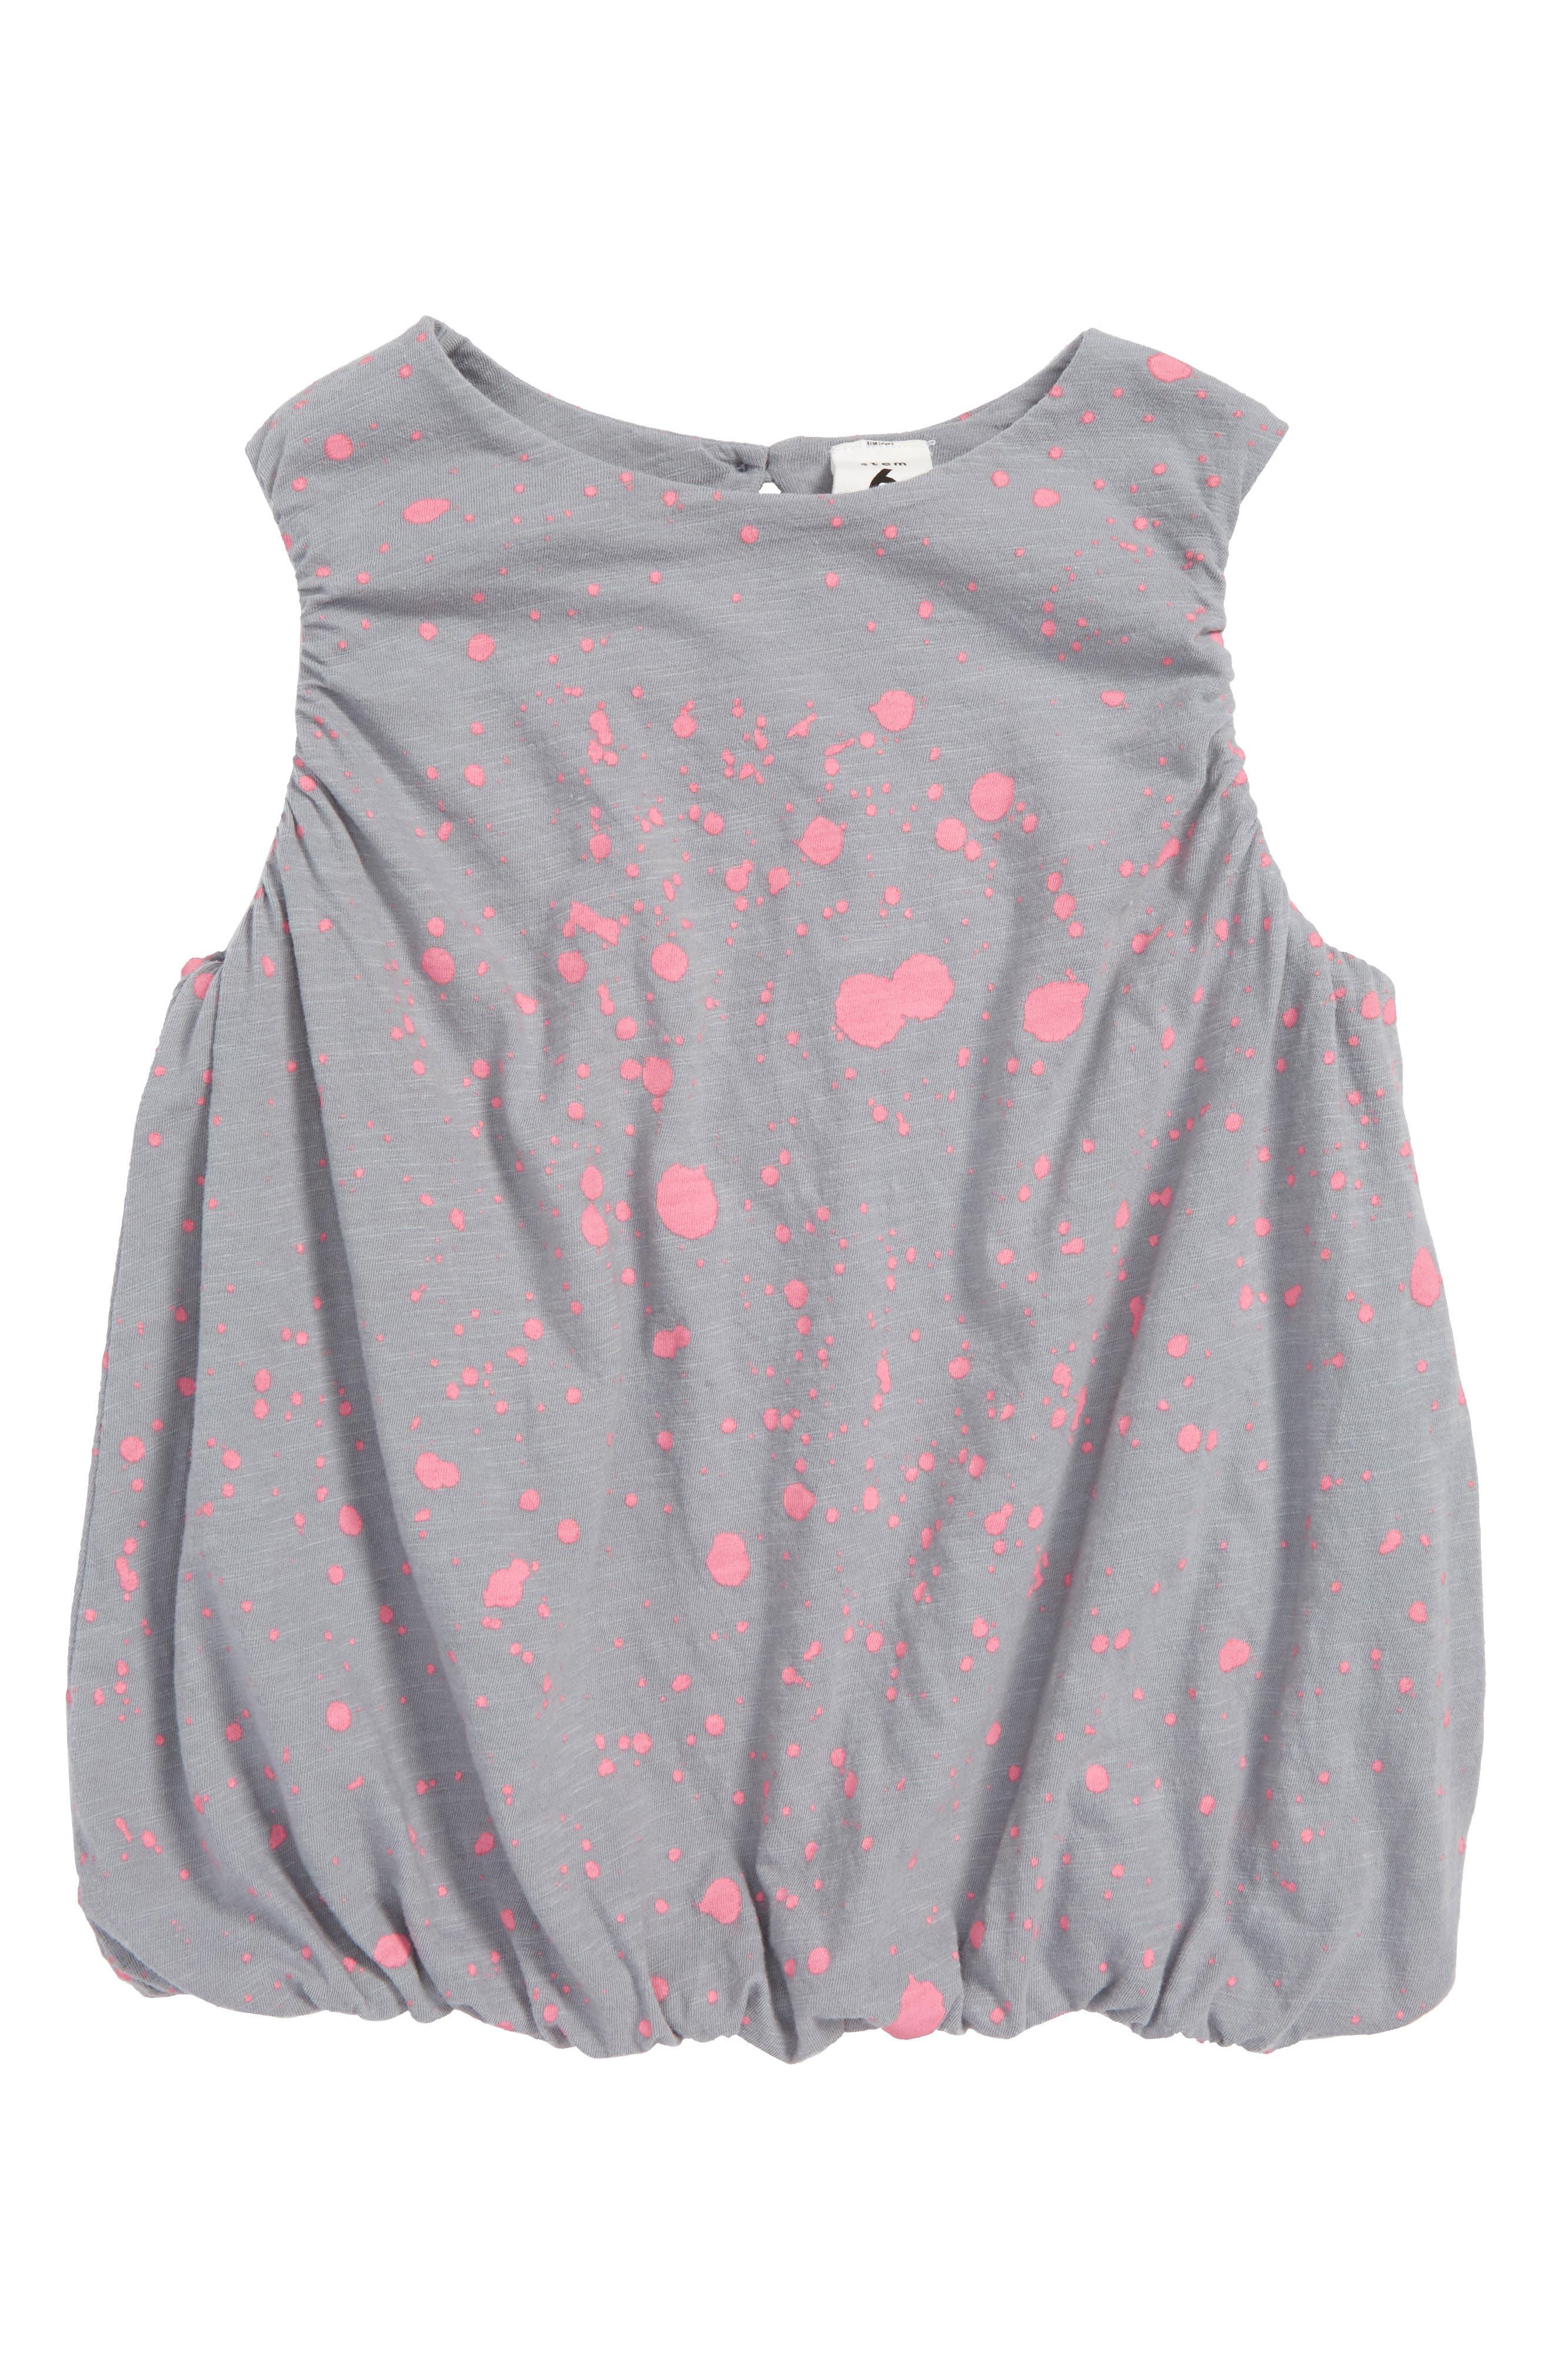 Print Bubble Tank,                             Main thumbnail 1, color,                             Grey Sleet- Pink Splatter